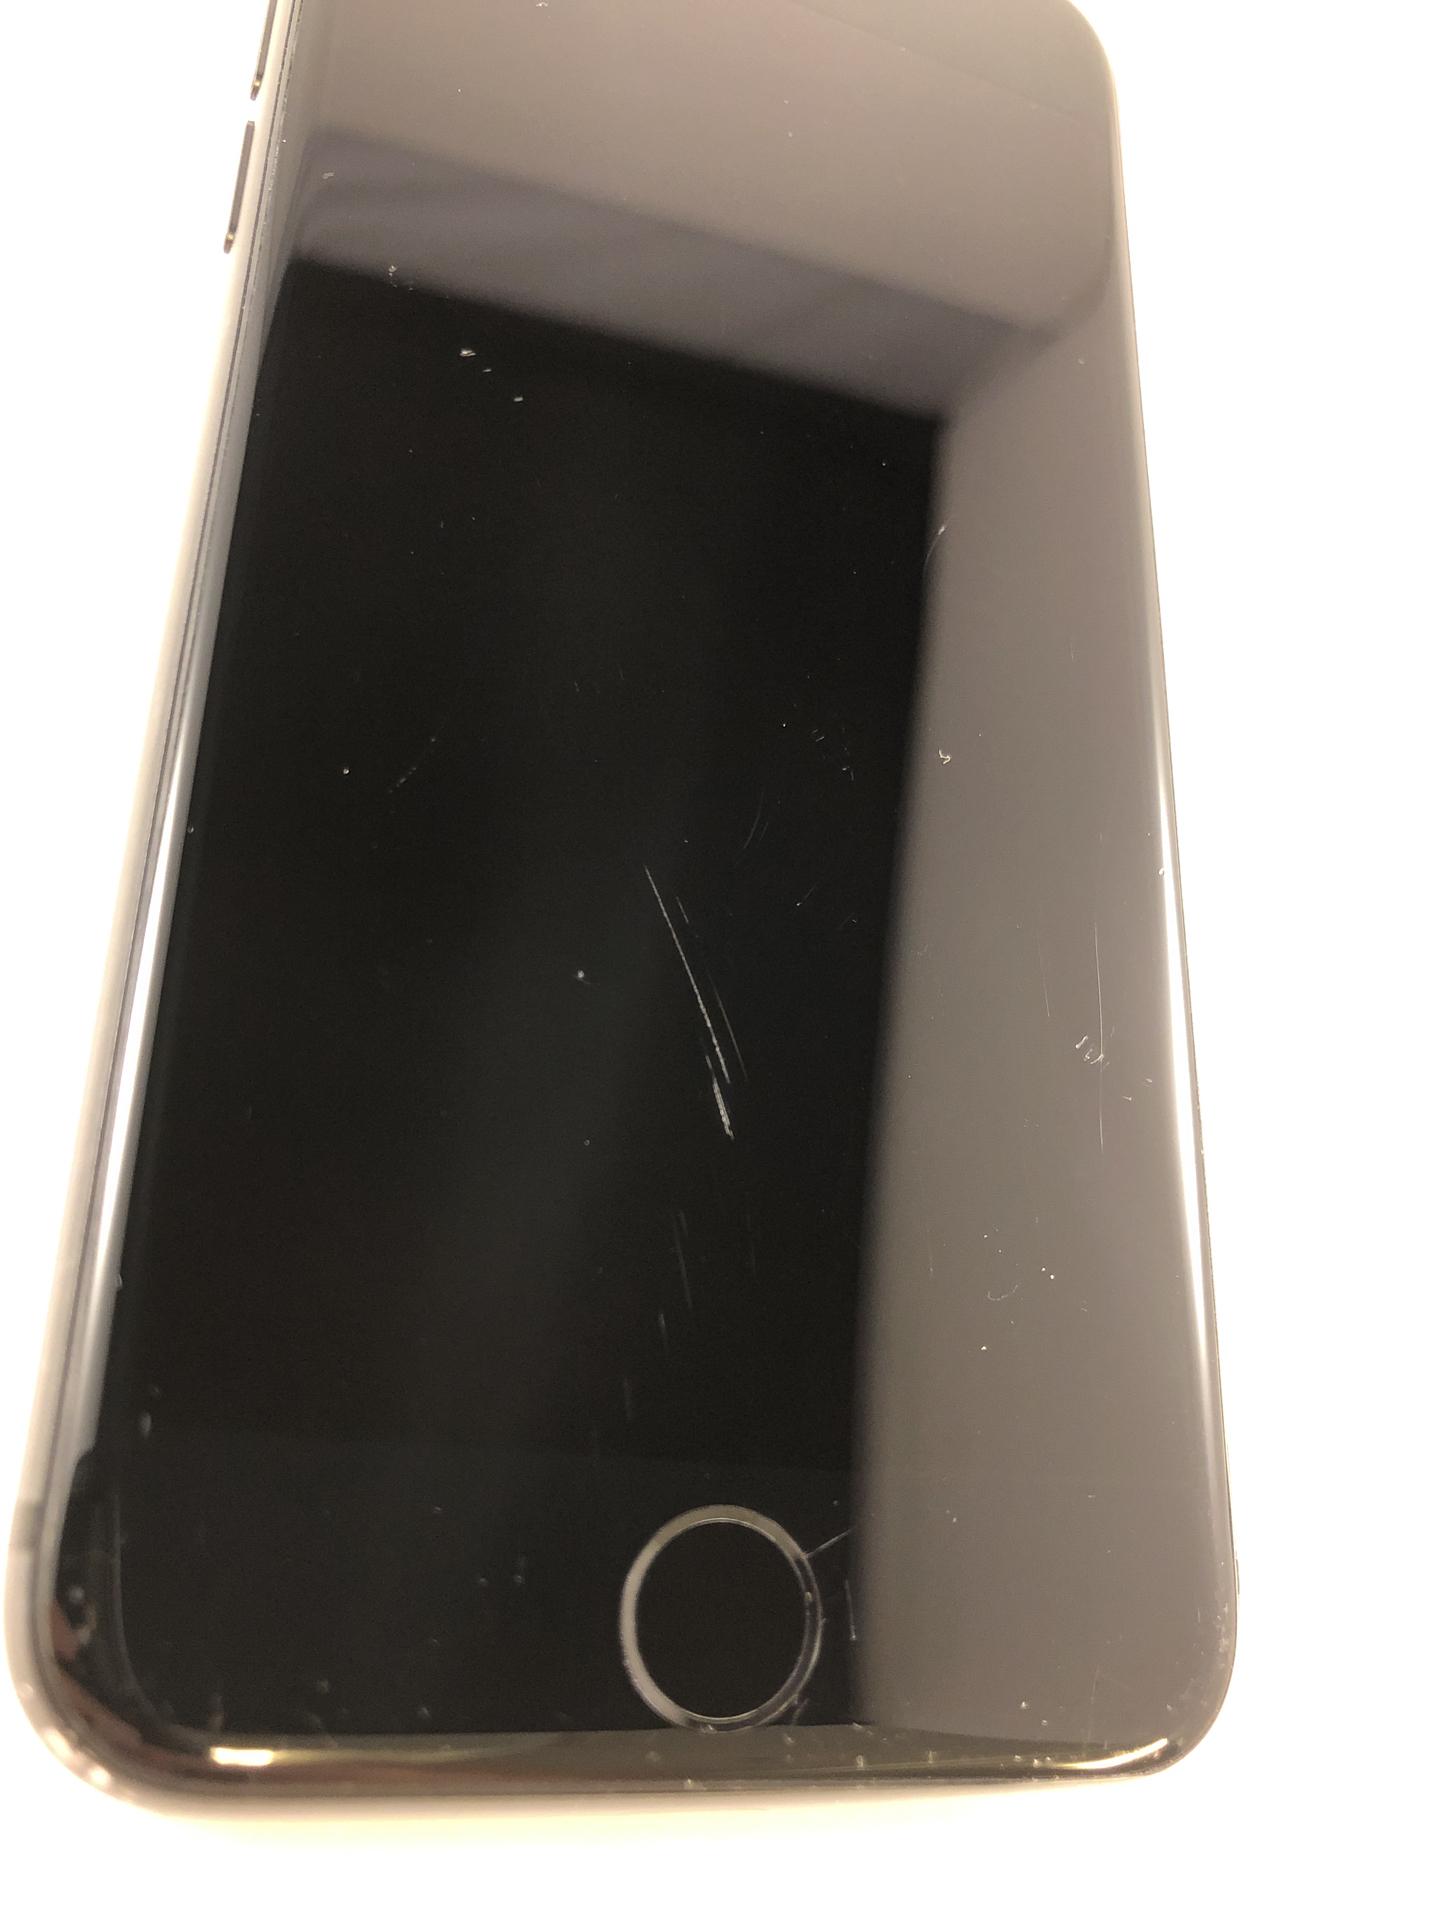 iPhone 8 256GB, 256GB, Space Gray, image 3